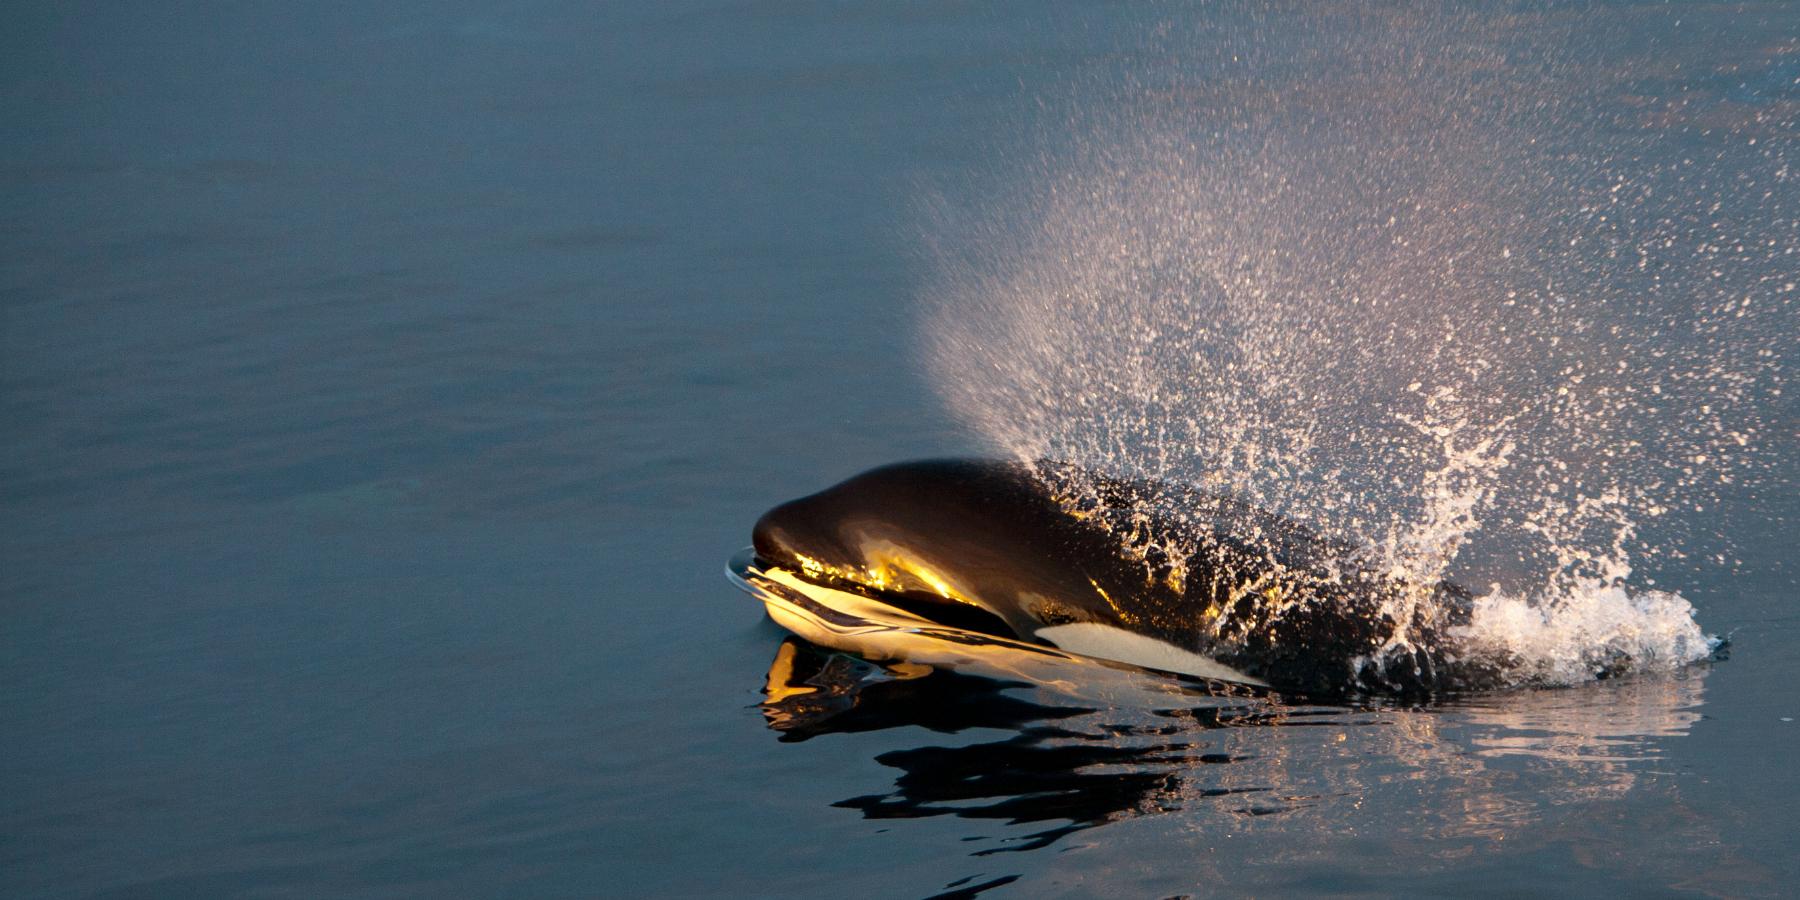 orque norvege PierreRobertdeLatour 1800x900 - 'Les orques, esprits de la mer', une émouvante BD